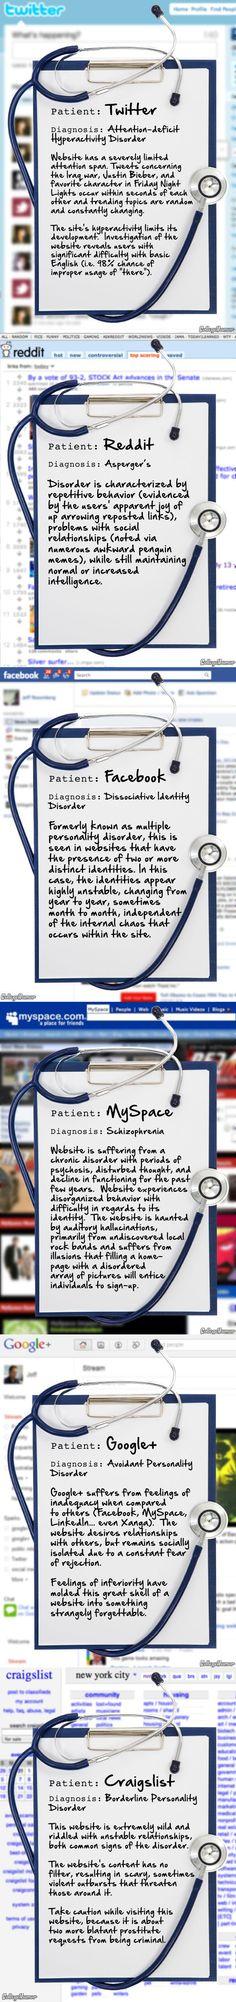 Infografía: Diagnostico médico de las redes sociales http://www.onedigital.mx/ww3/2012/05/13/infografia-diagnostico-medico-de-las-redes-sociales/